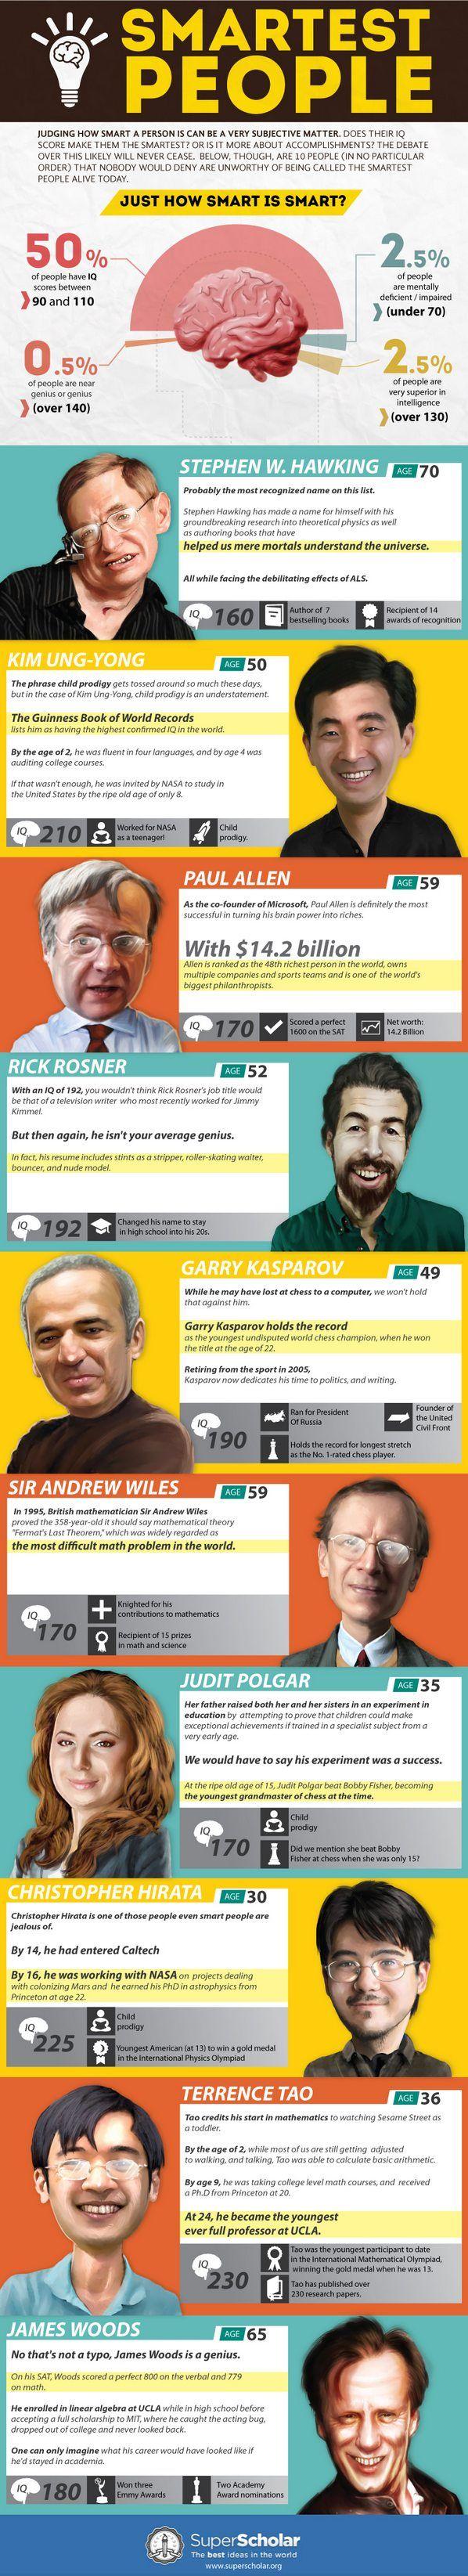 10 Smartest People!